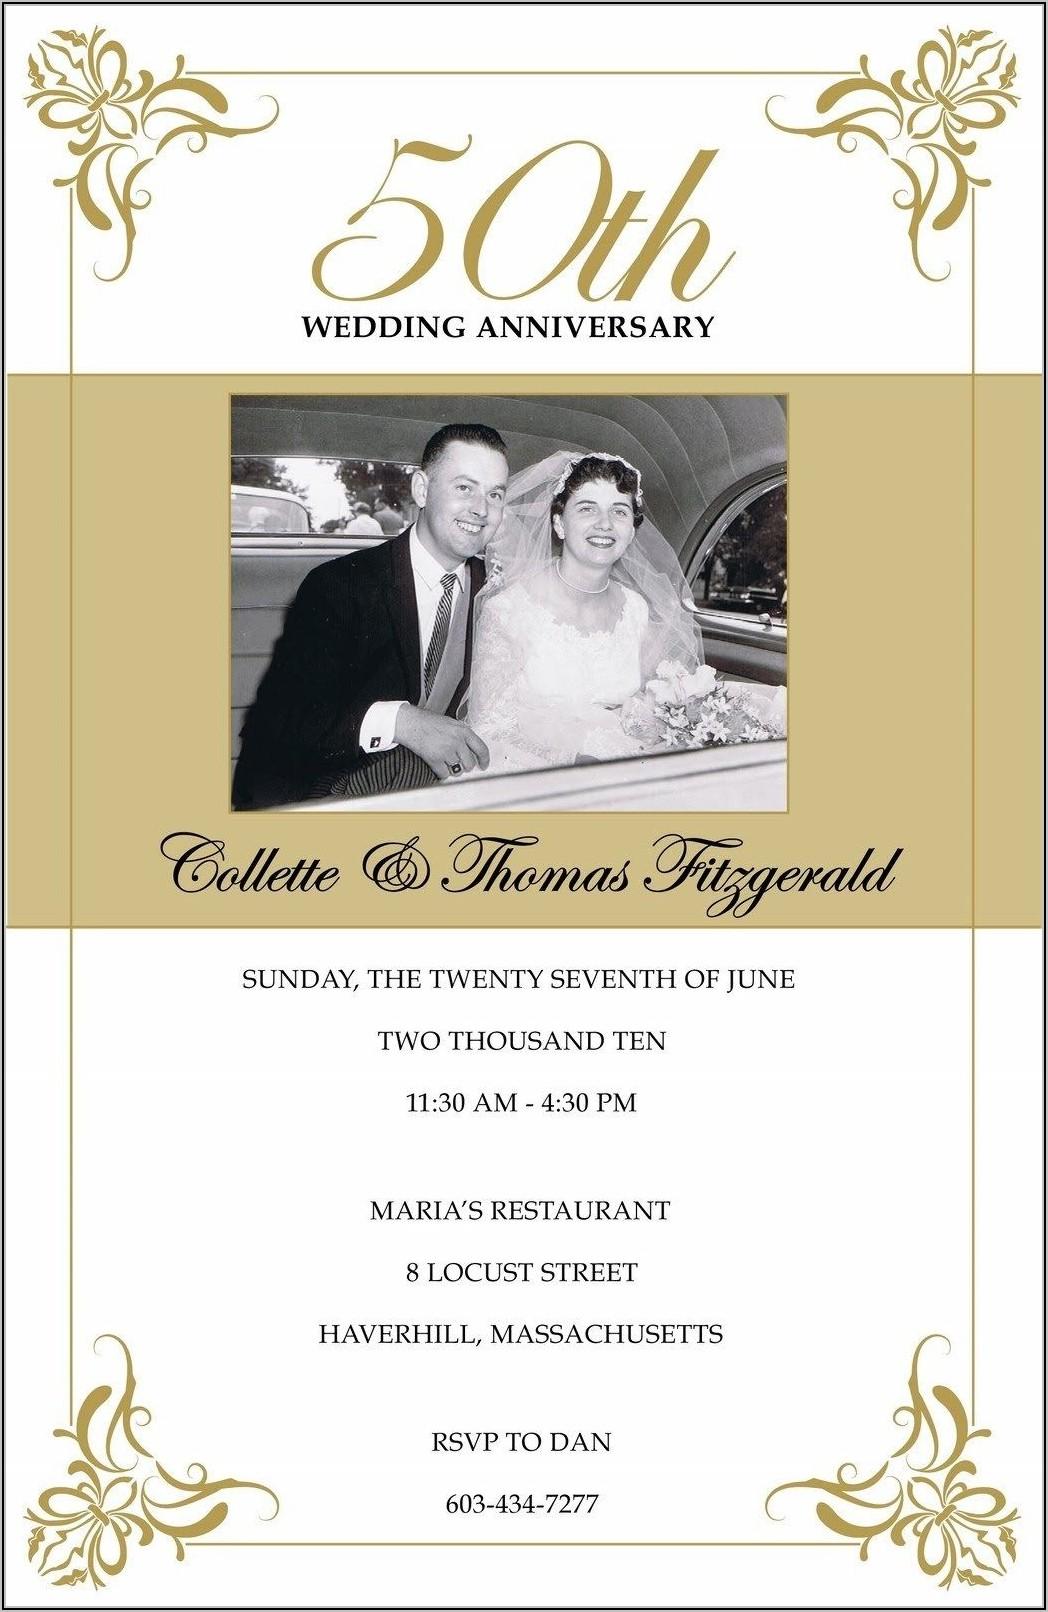 50th Wedding Anniversary Newspaper Announcement Template